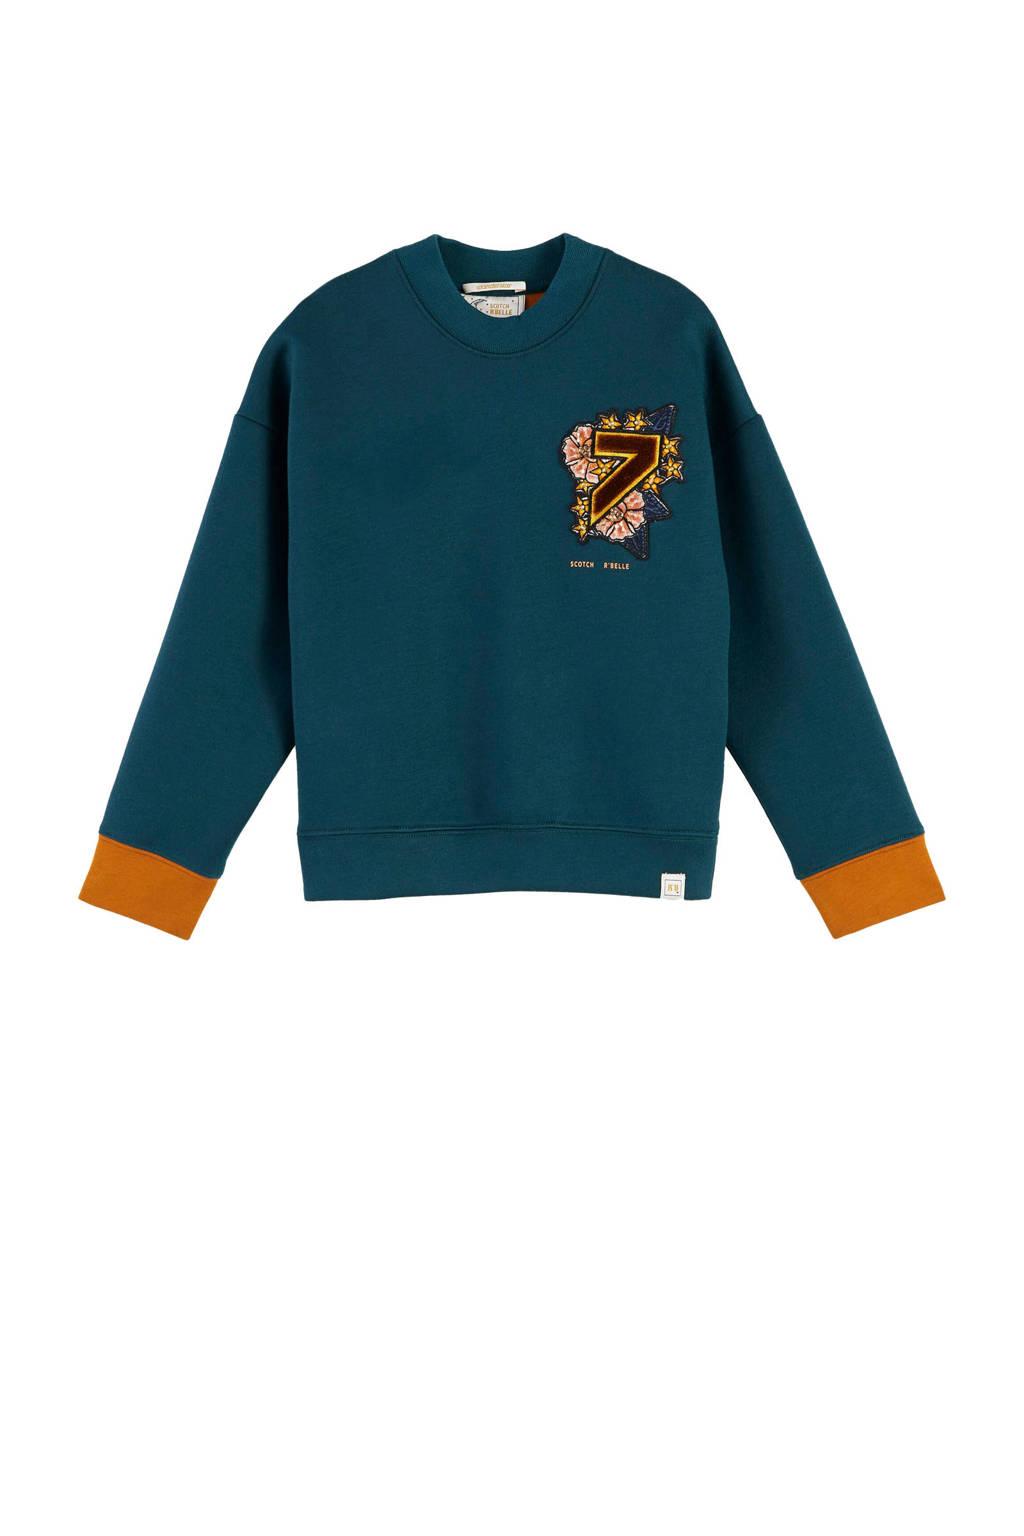 Scotch & Soda sweater met printopdruk en patches blauw/oranje, Blauw/oranje